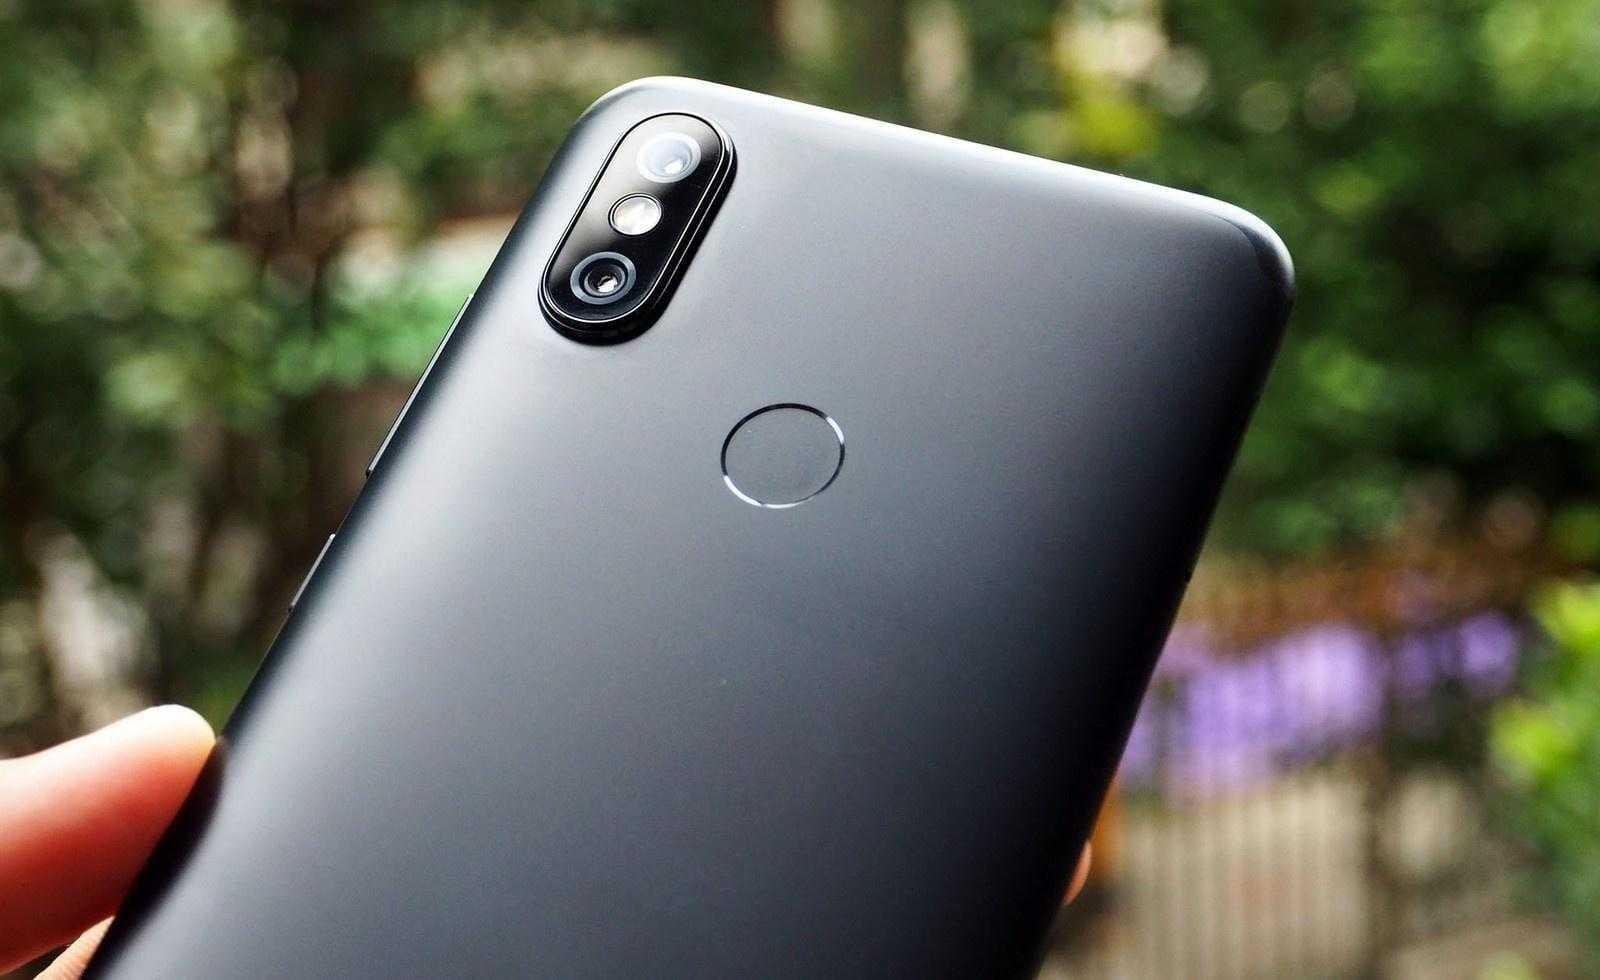 ТОП-5 причин купить Xiaomi Mi A2 (xiaomi mi a2 5 e1532515760211)